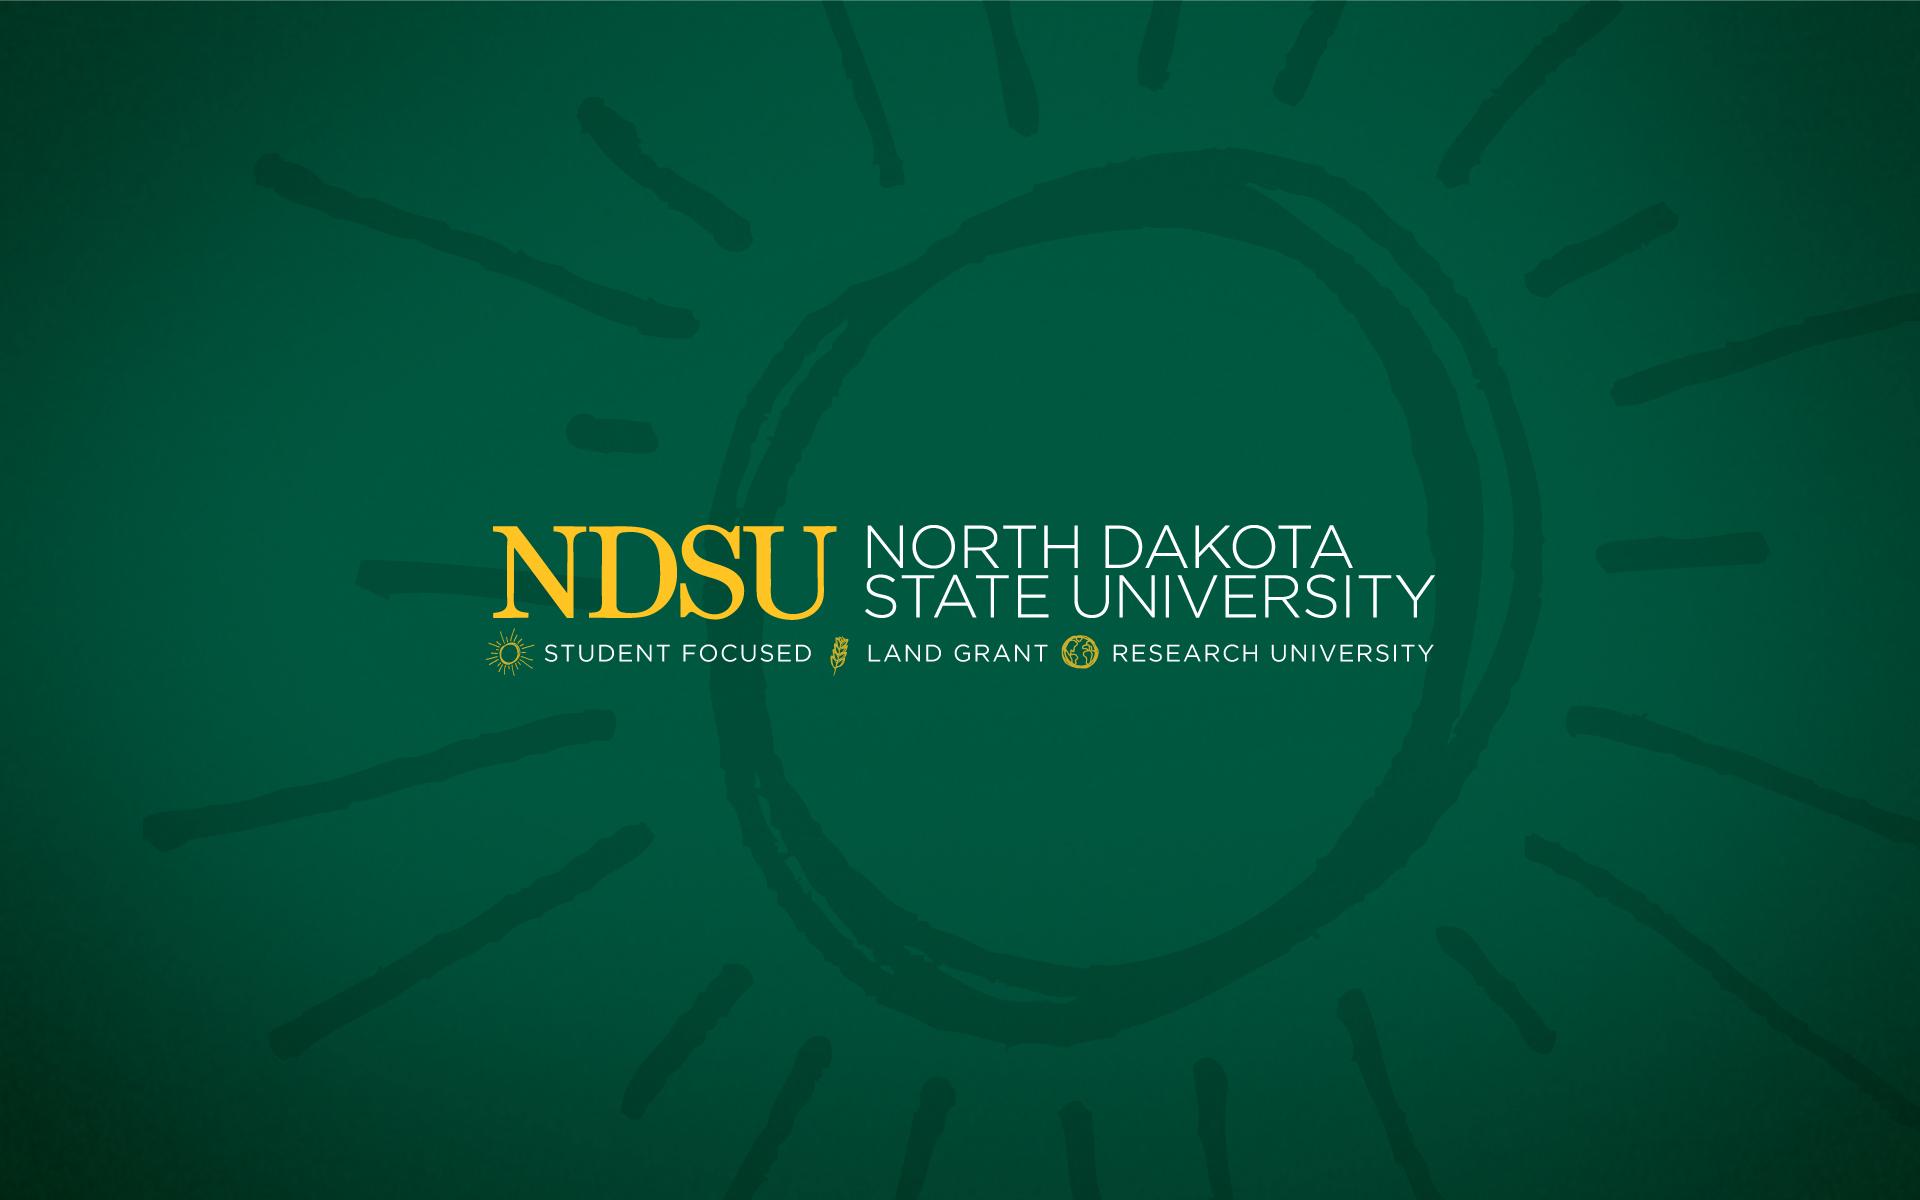 North Dakota State University 1920x1200